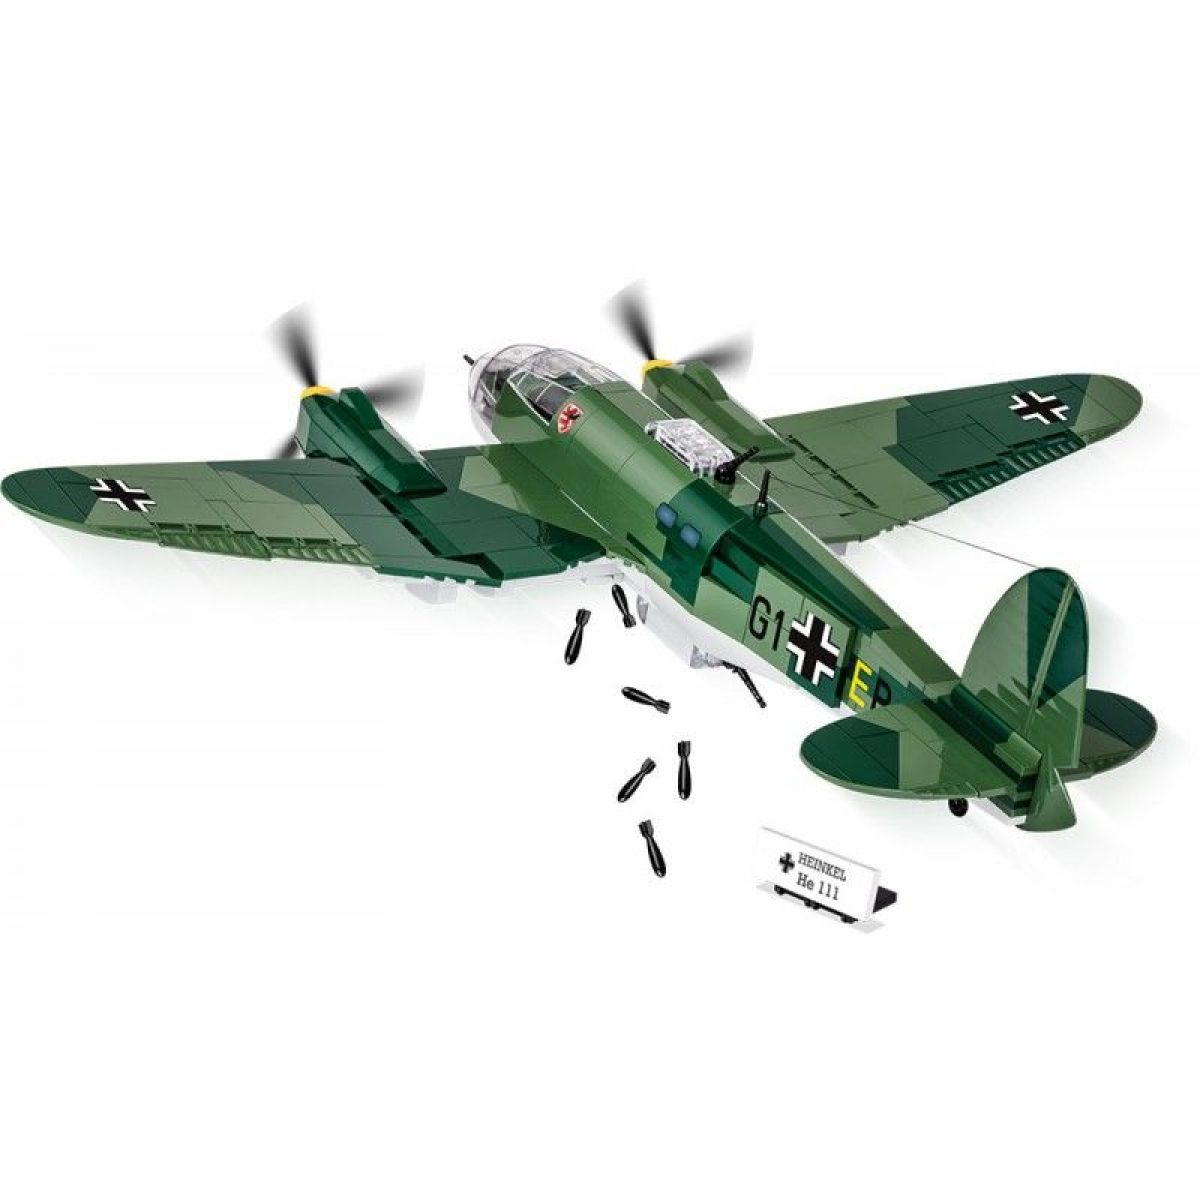 Cobi Malá armáda 5534 II WW Heinkel HE 111 P-4